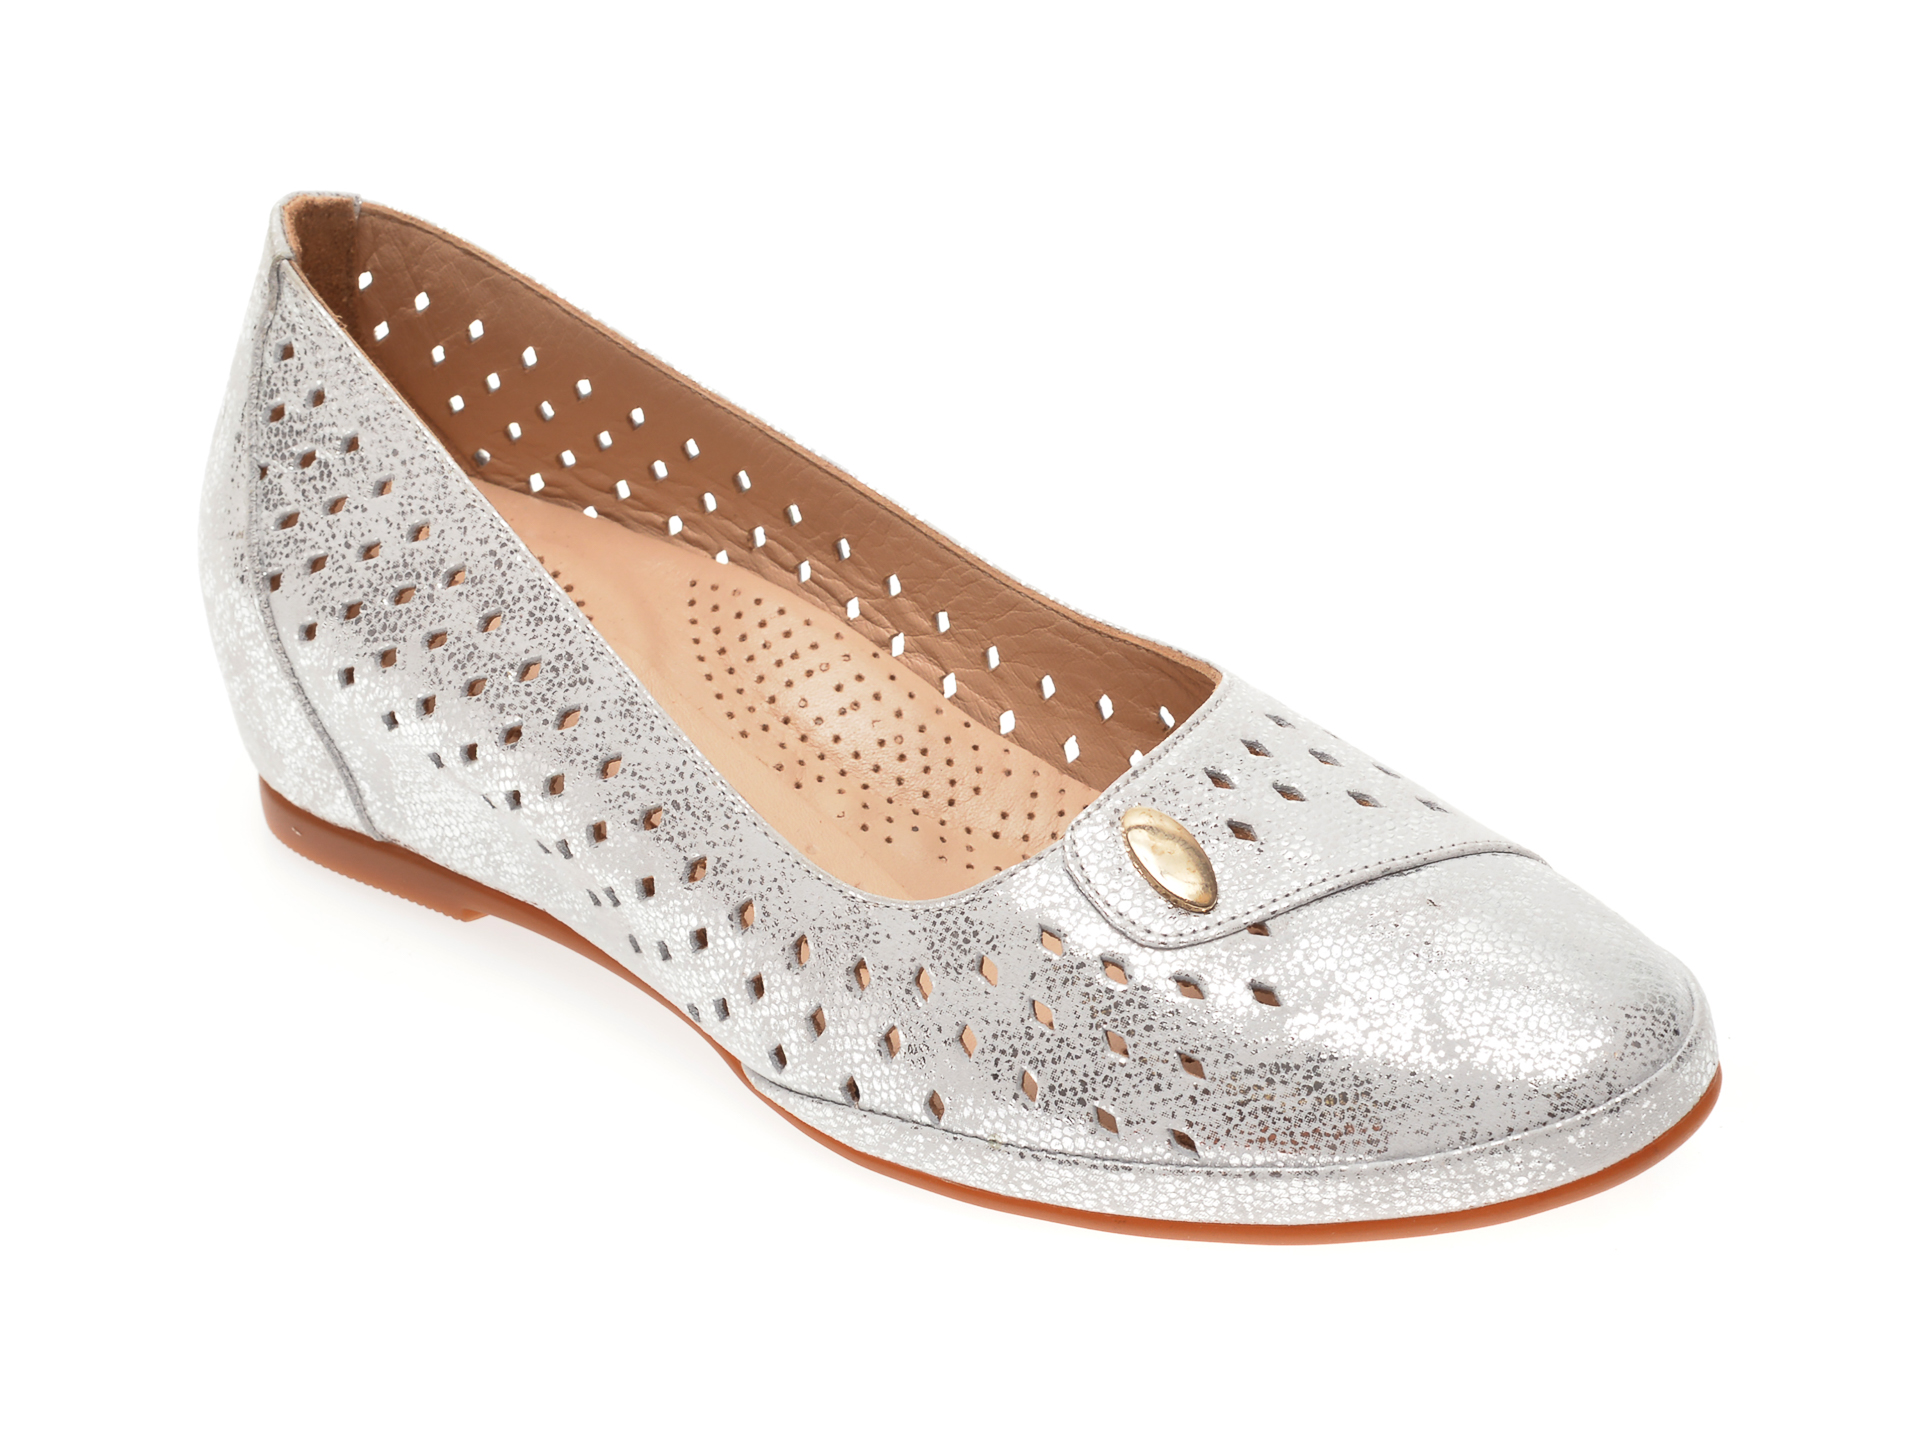 Pantofi FLAVIA PASSINI argintii, 0105015, din piele naturala